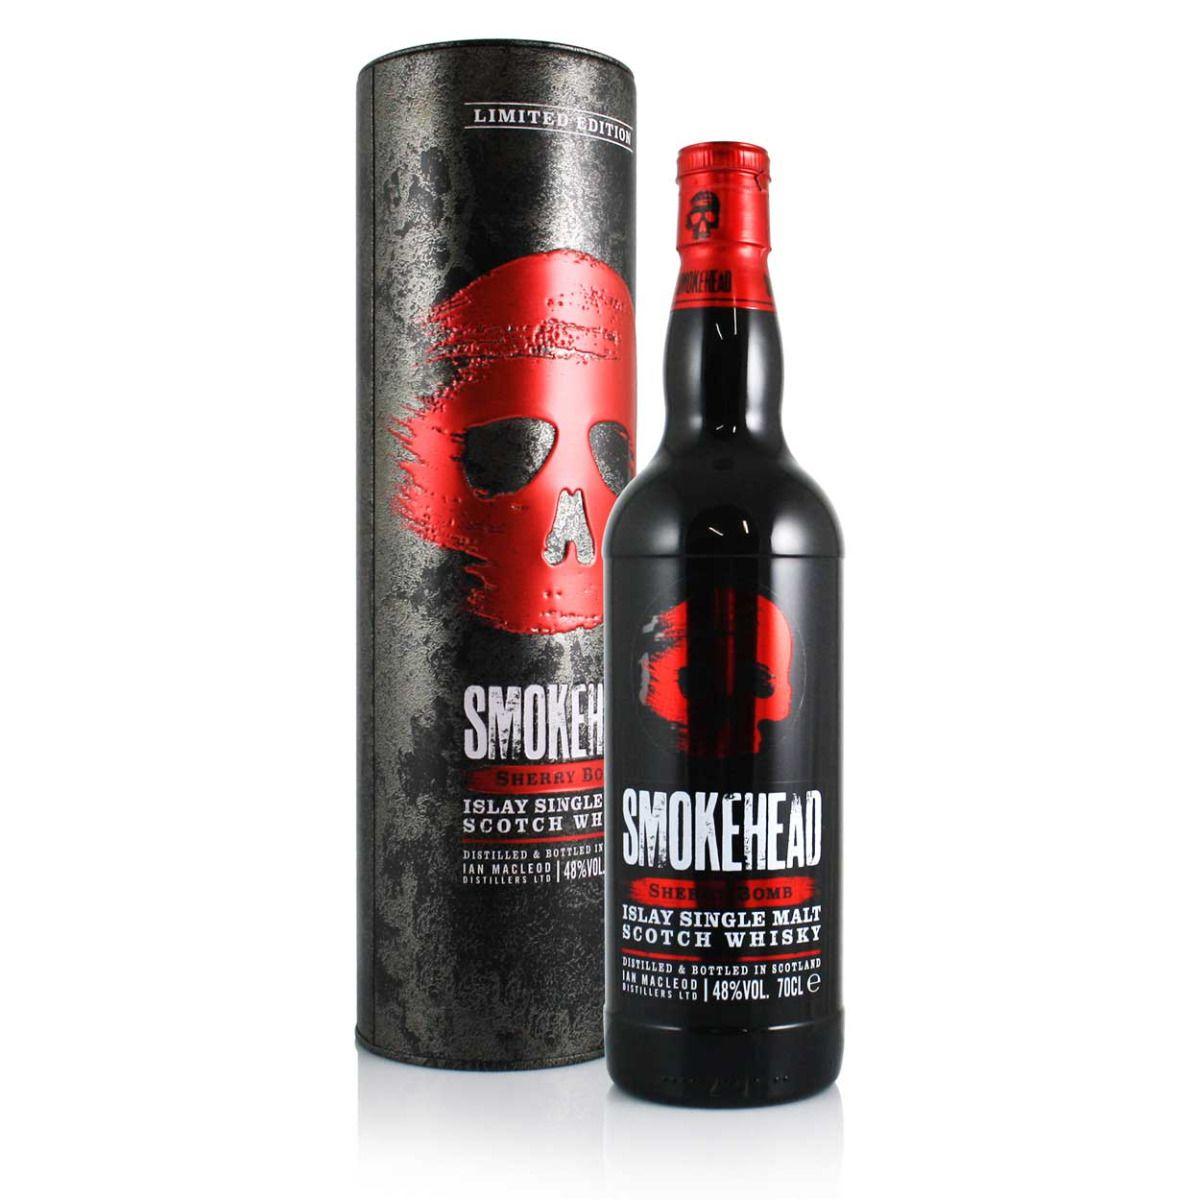 Smokehead_sherry_bomb_Single_Malt_Whisky_RR_Selection_spletna_trgovina_alkohol_slovenija.jpg